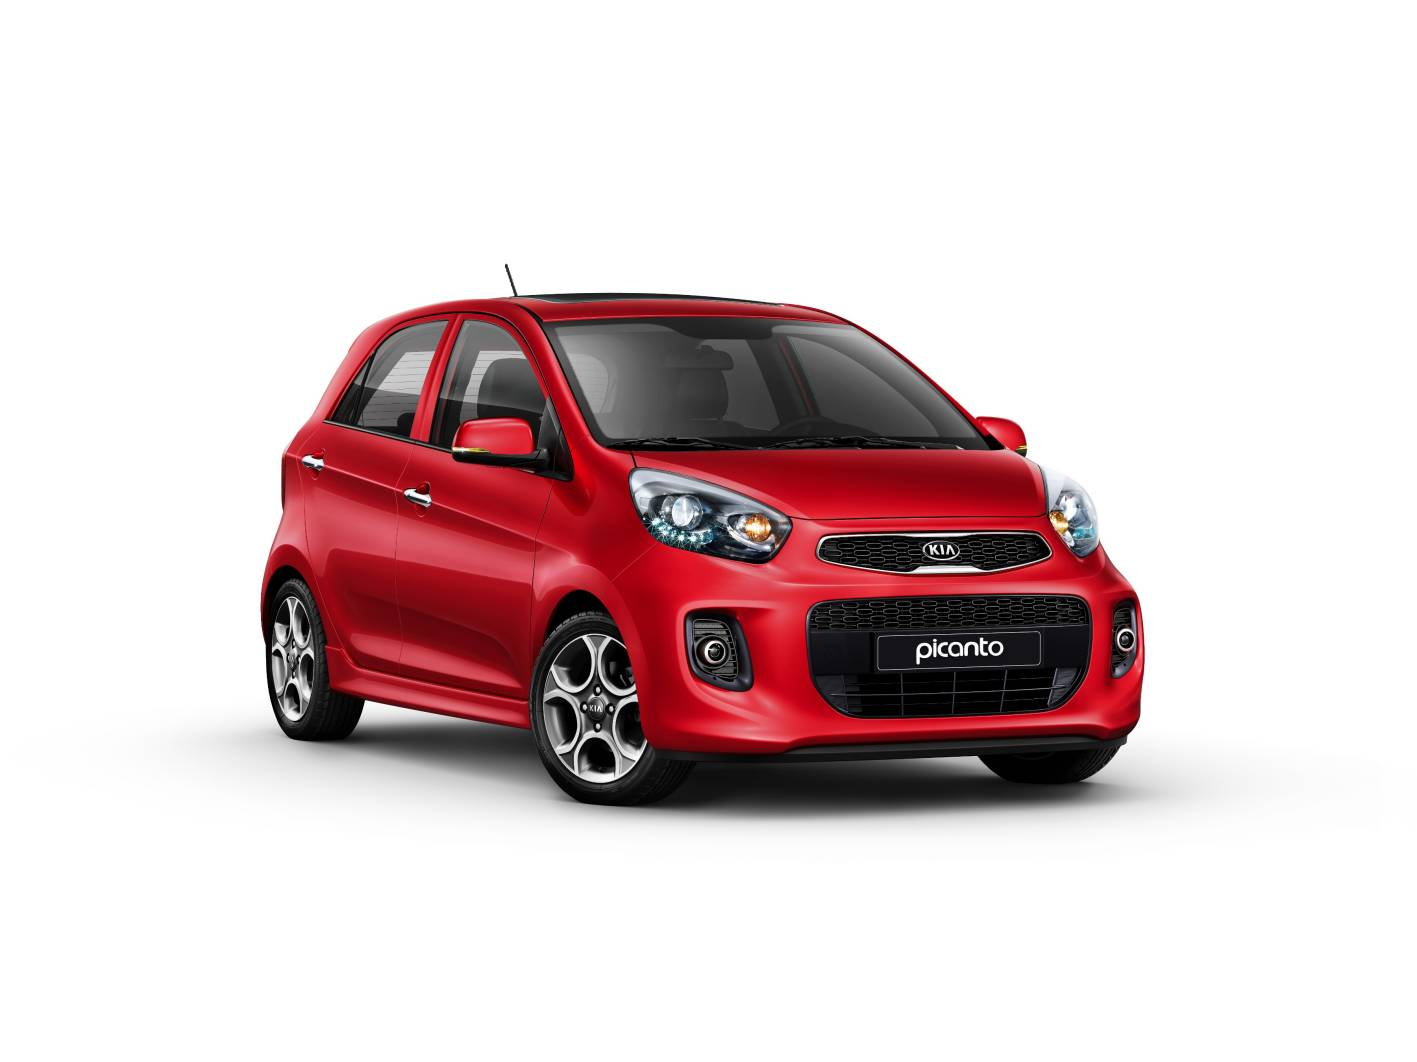 2017 kia picanto review what car